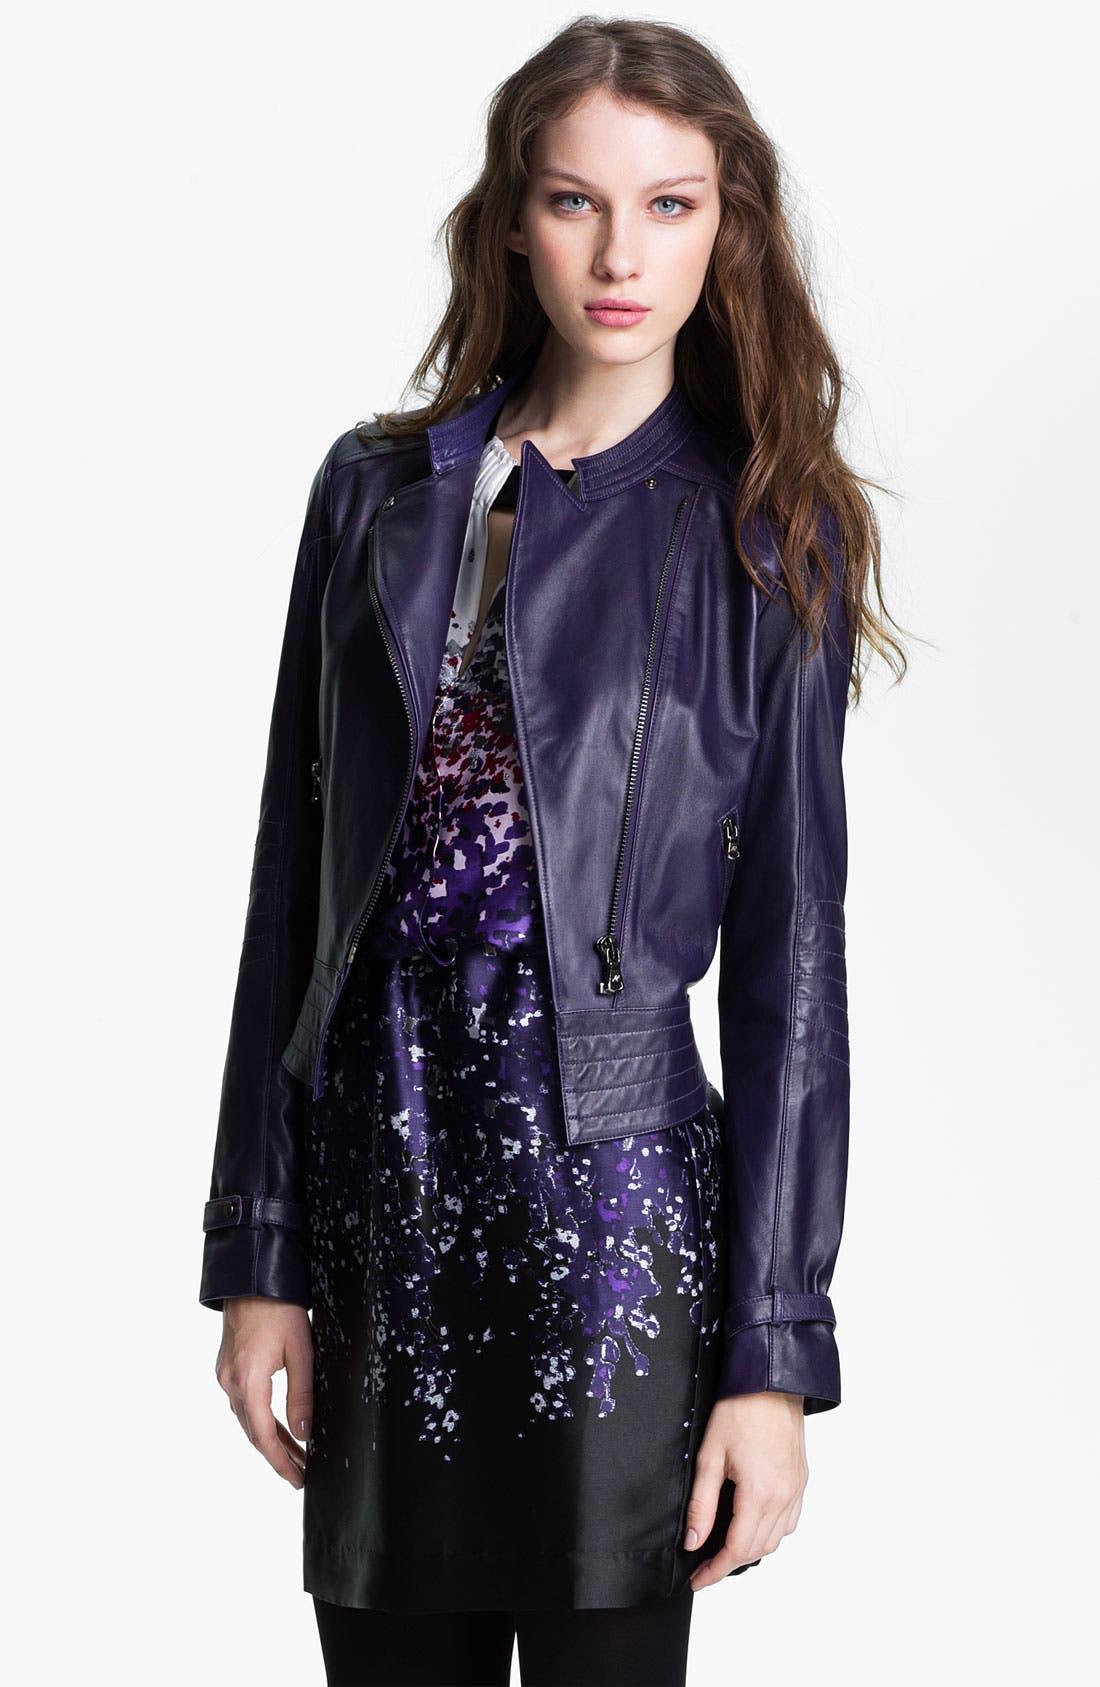 Alternate Image 1 Selected - Kenneth Cole New York 'Maria' Metallic Leather Jacket